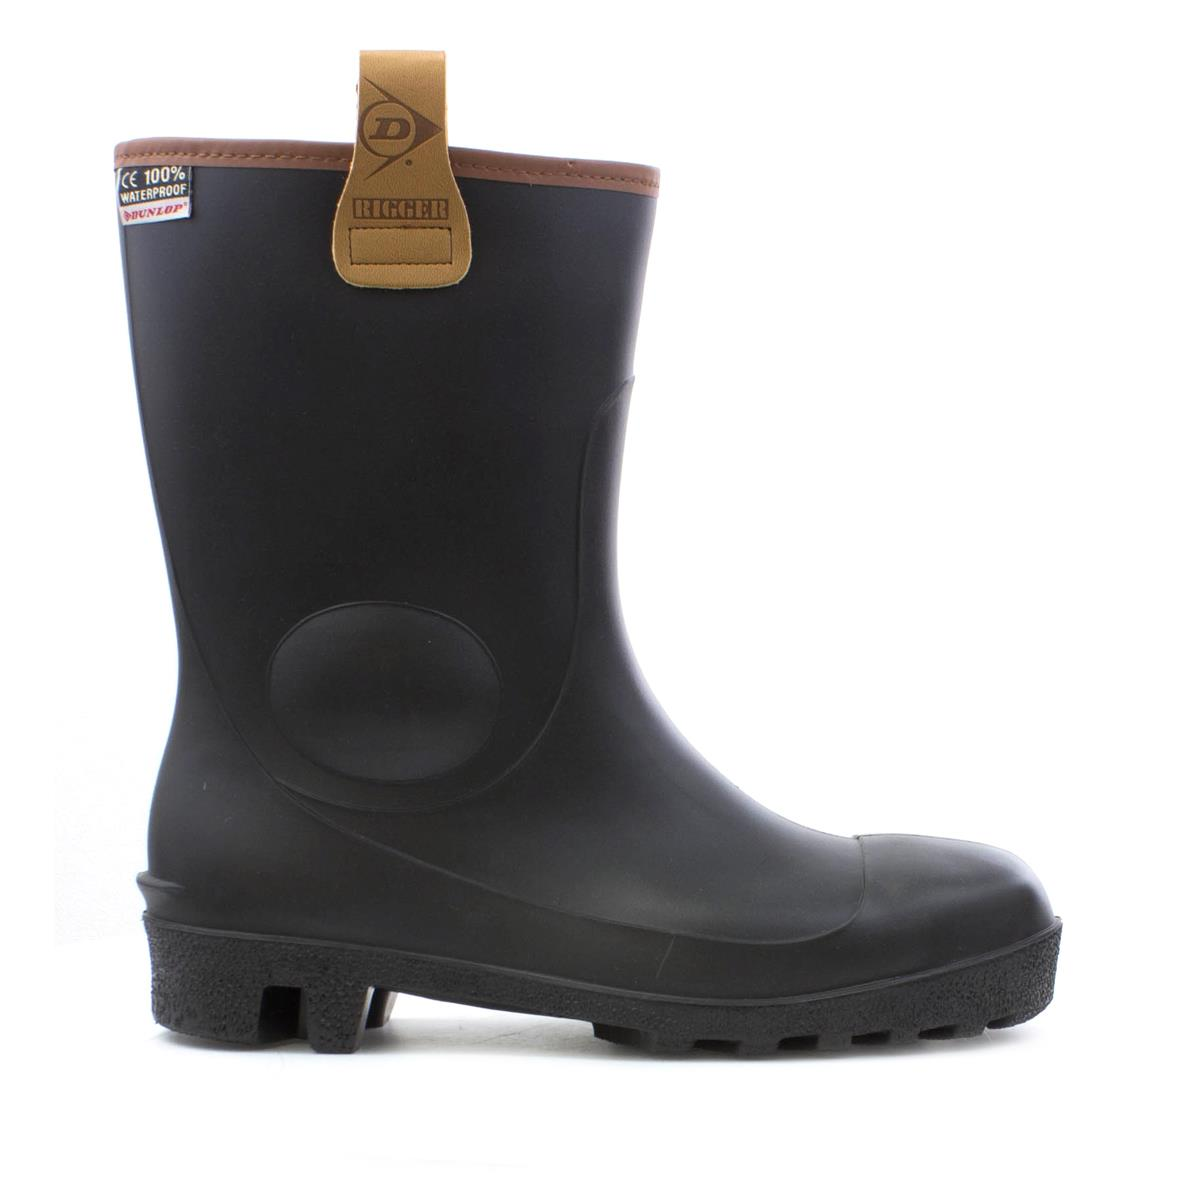 a4546ed34dc Dunlop Mens Black Rigger Safety Wellington Boot